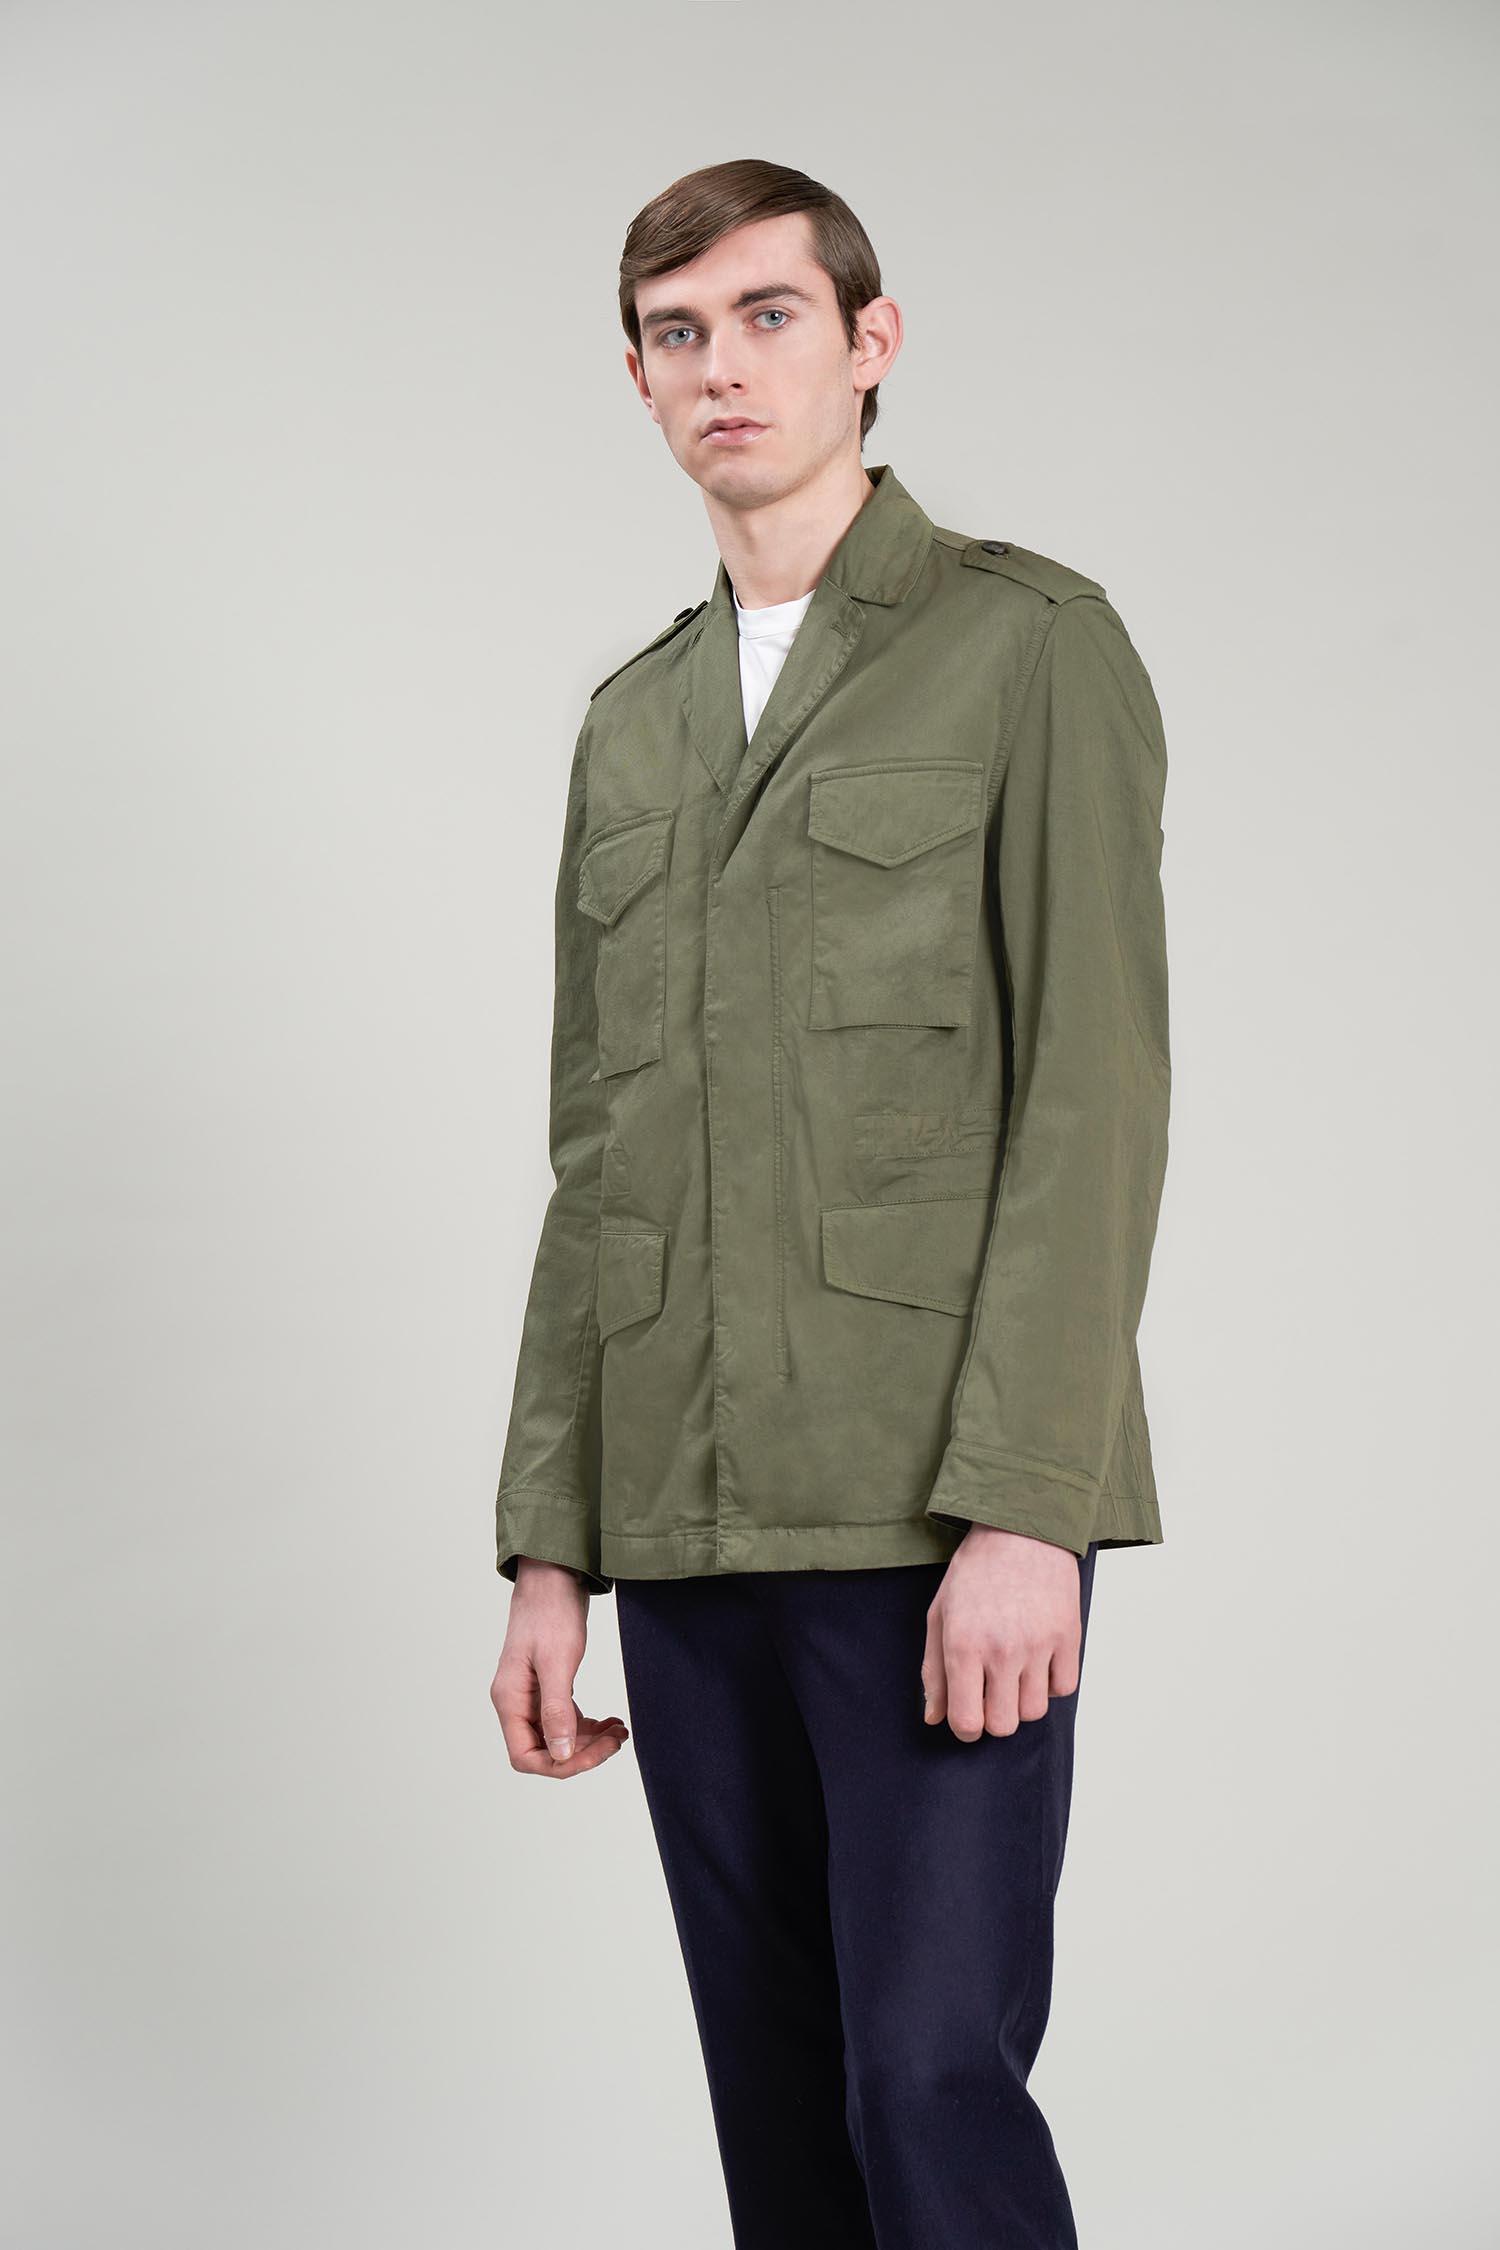 MALO_Military Jacket (3)